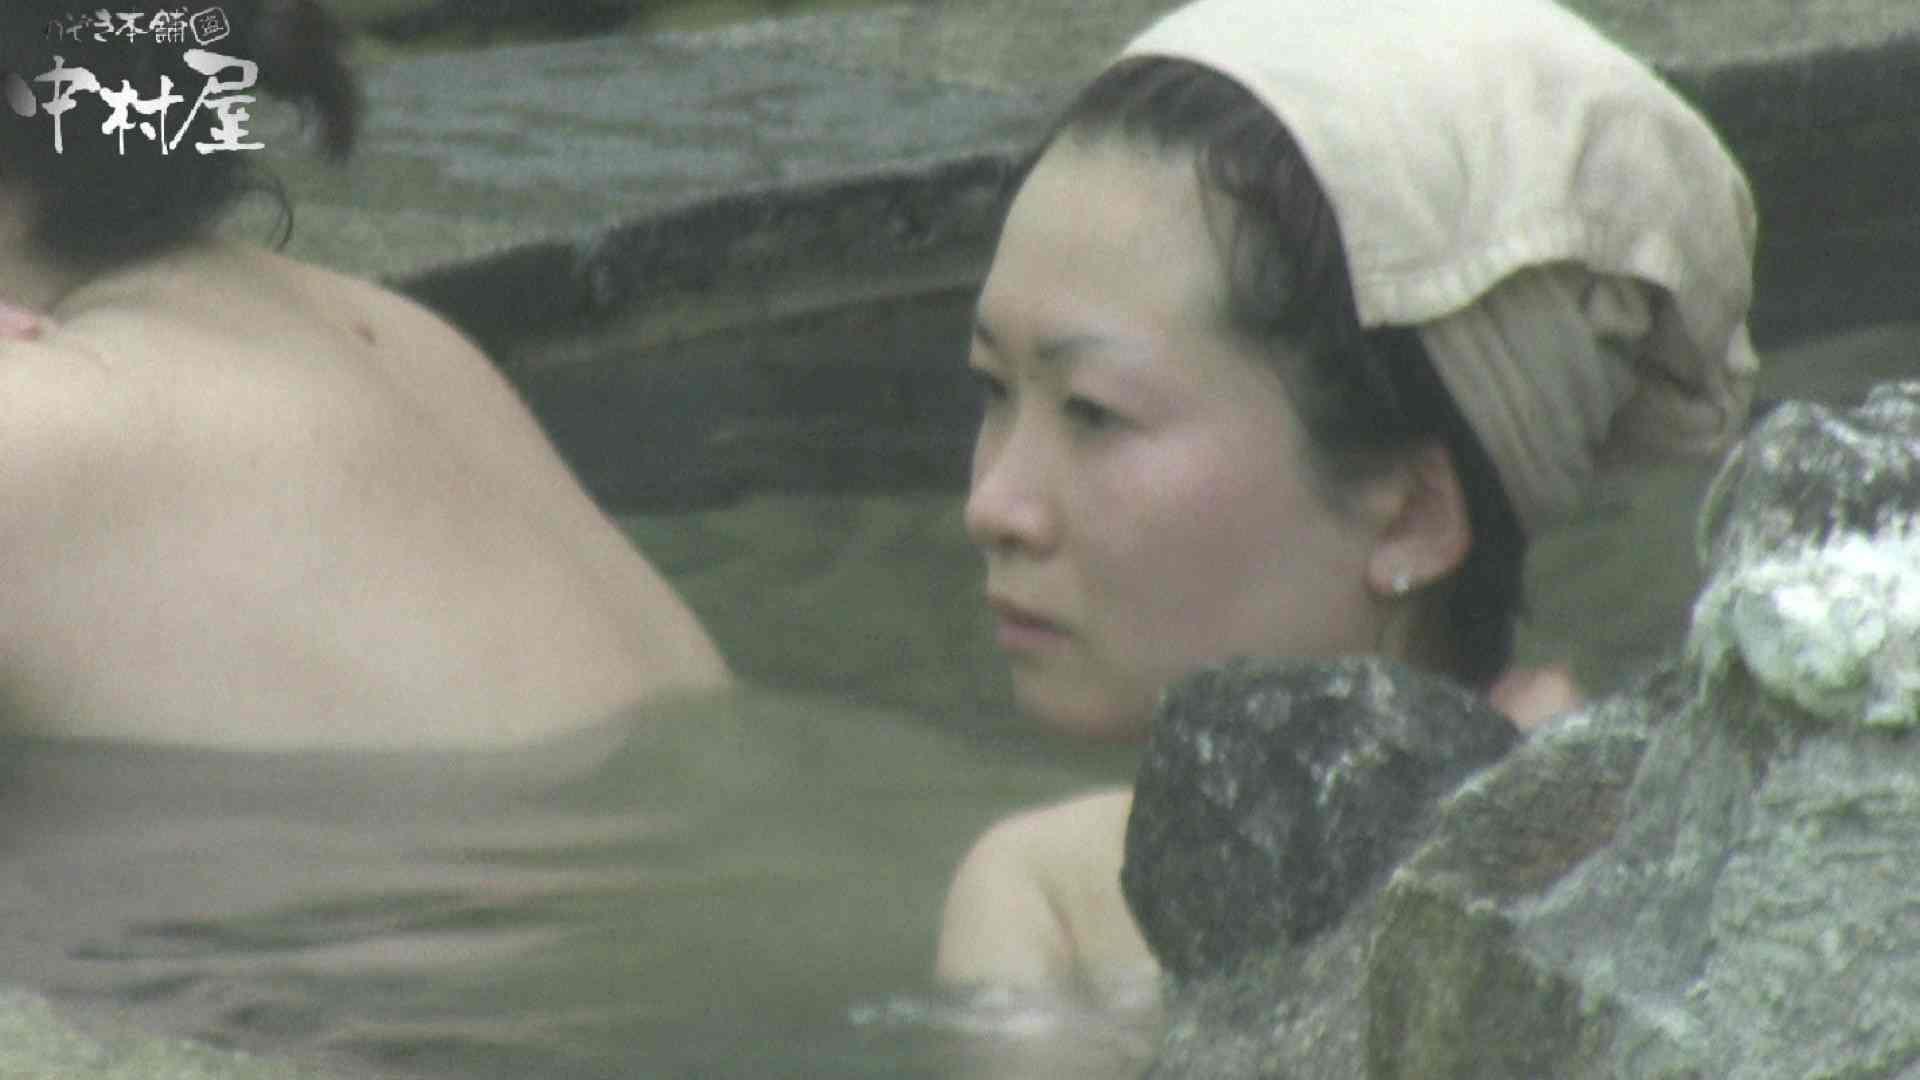 Aquaな露天風呂Vol.906 露天風呂編 | 盗撮シリーズ  86PIX 79